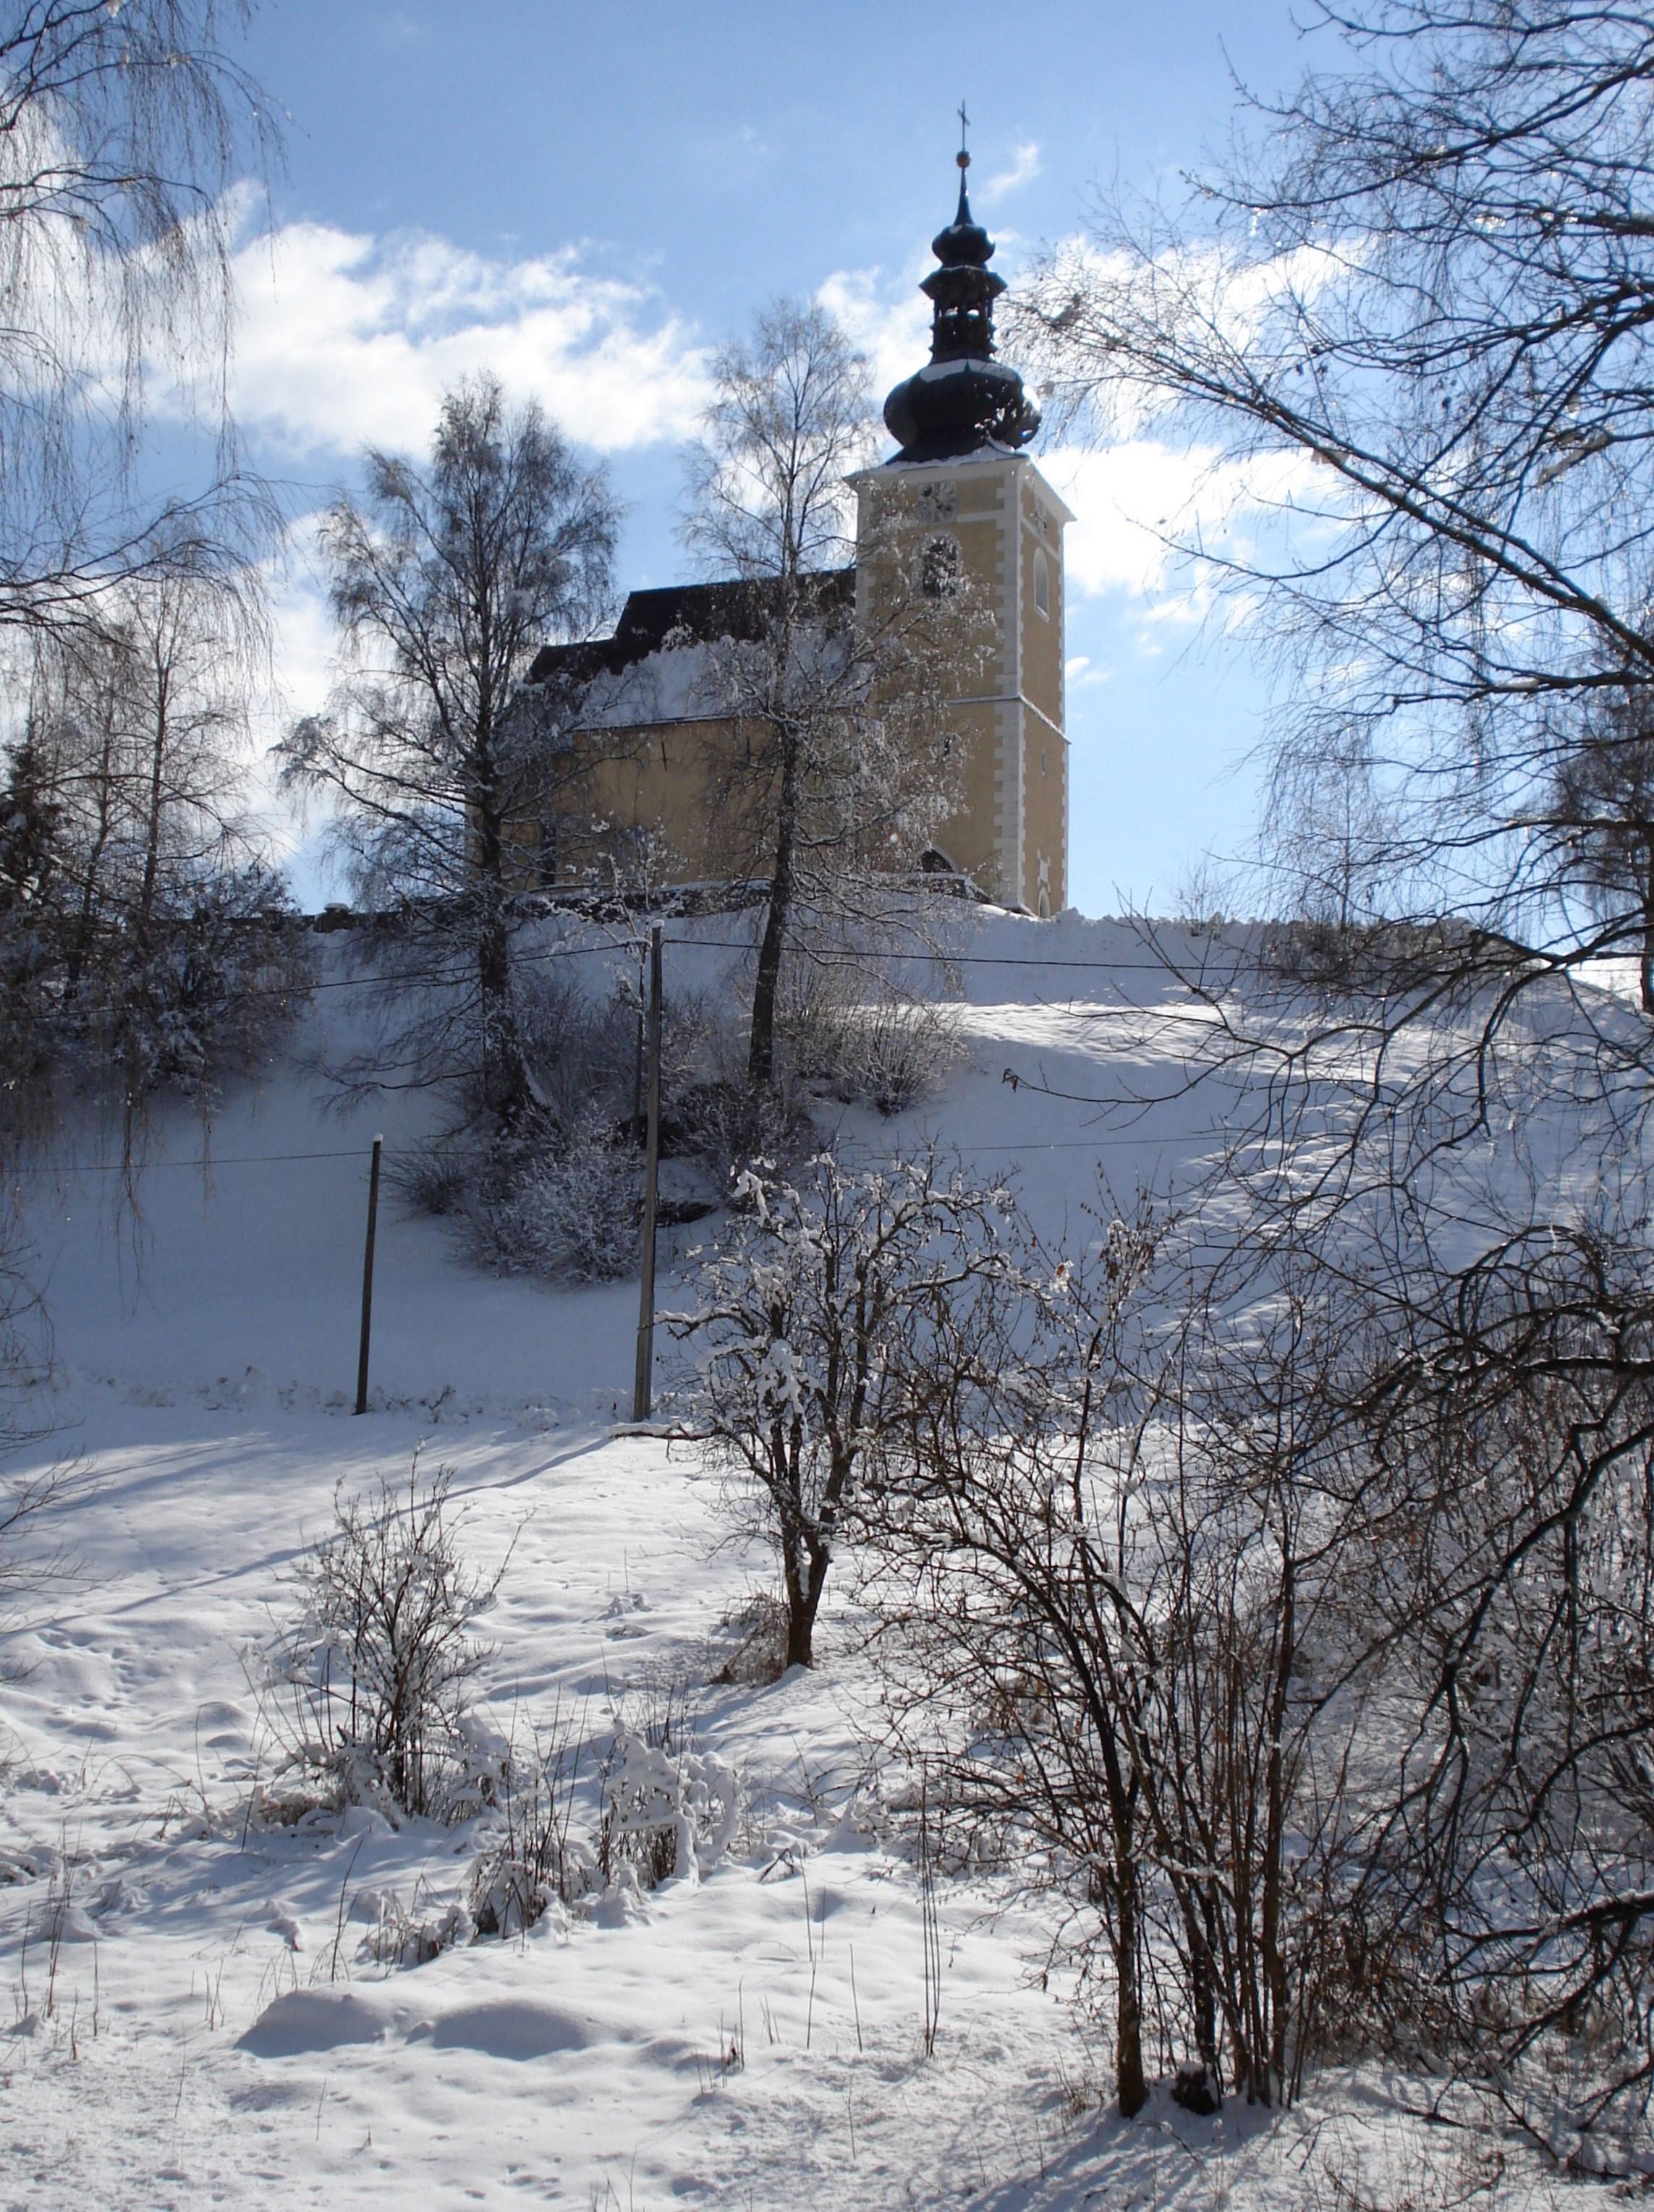 Wachsenberg